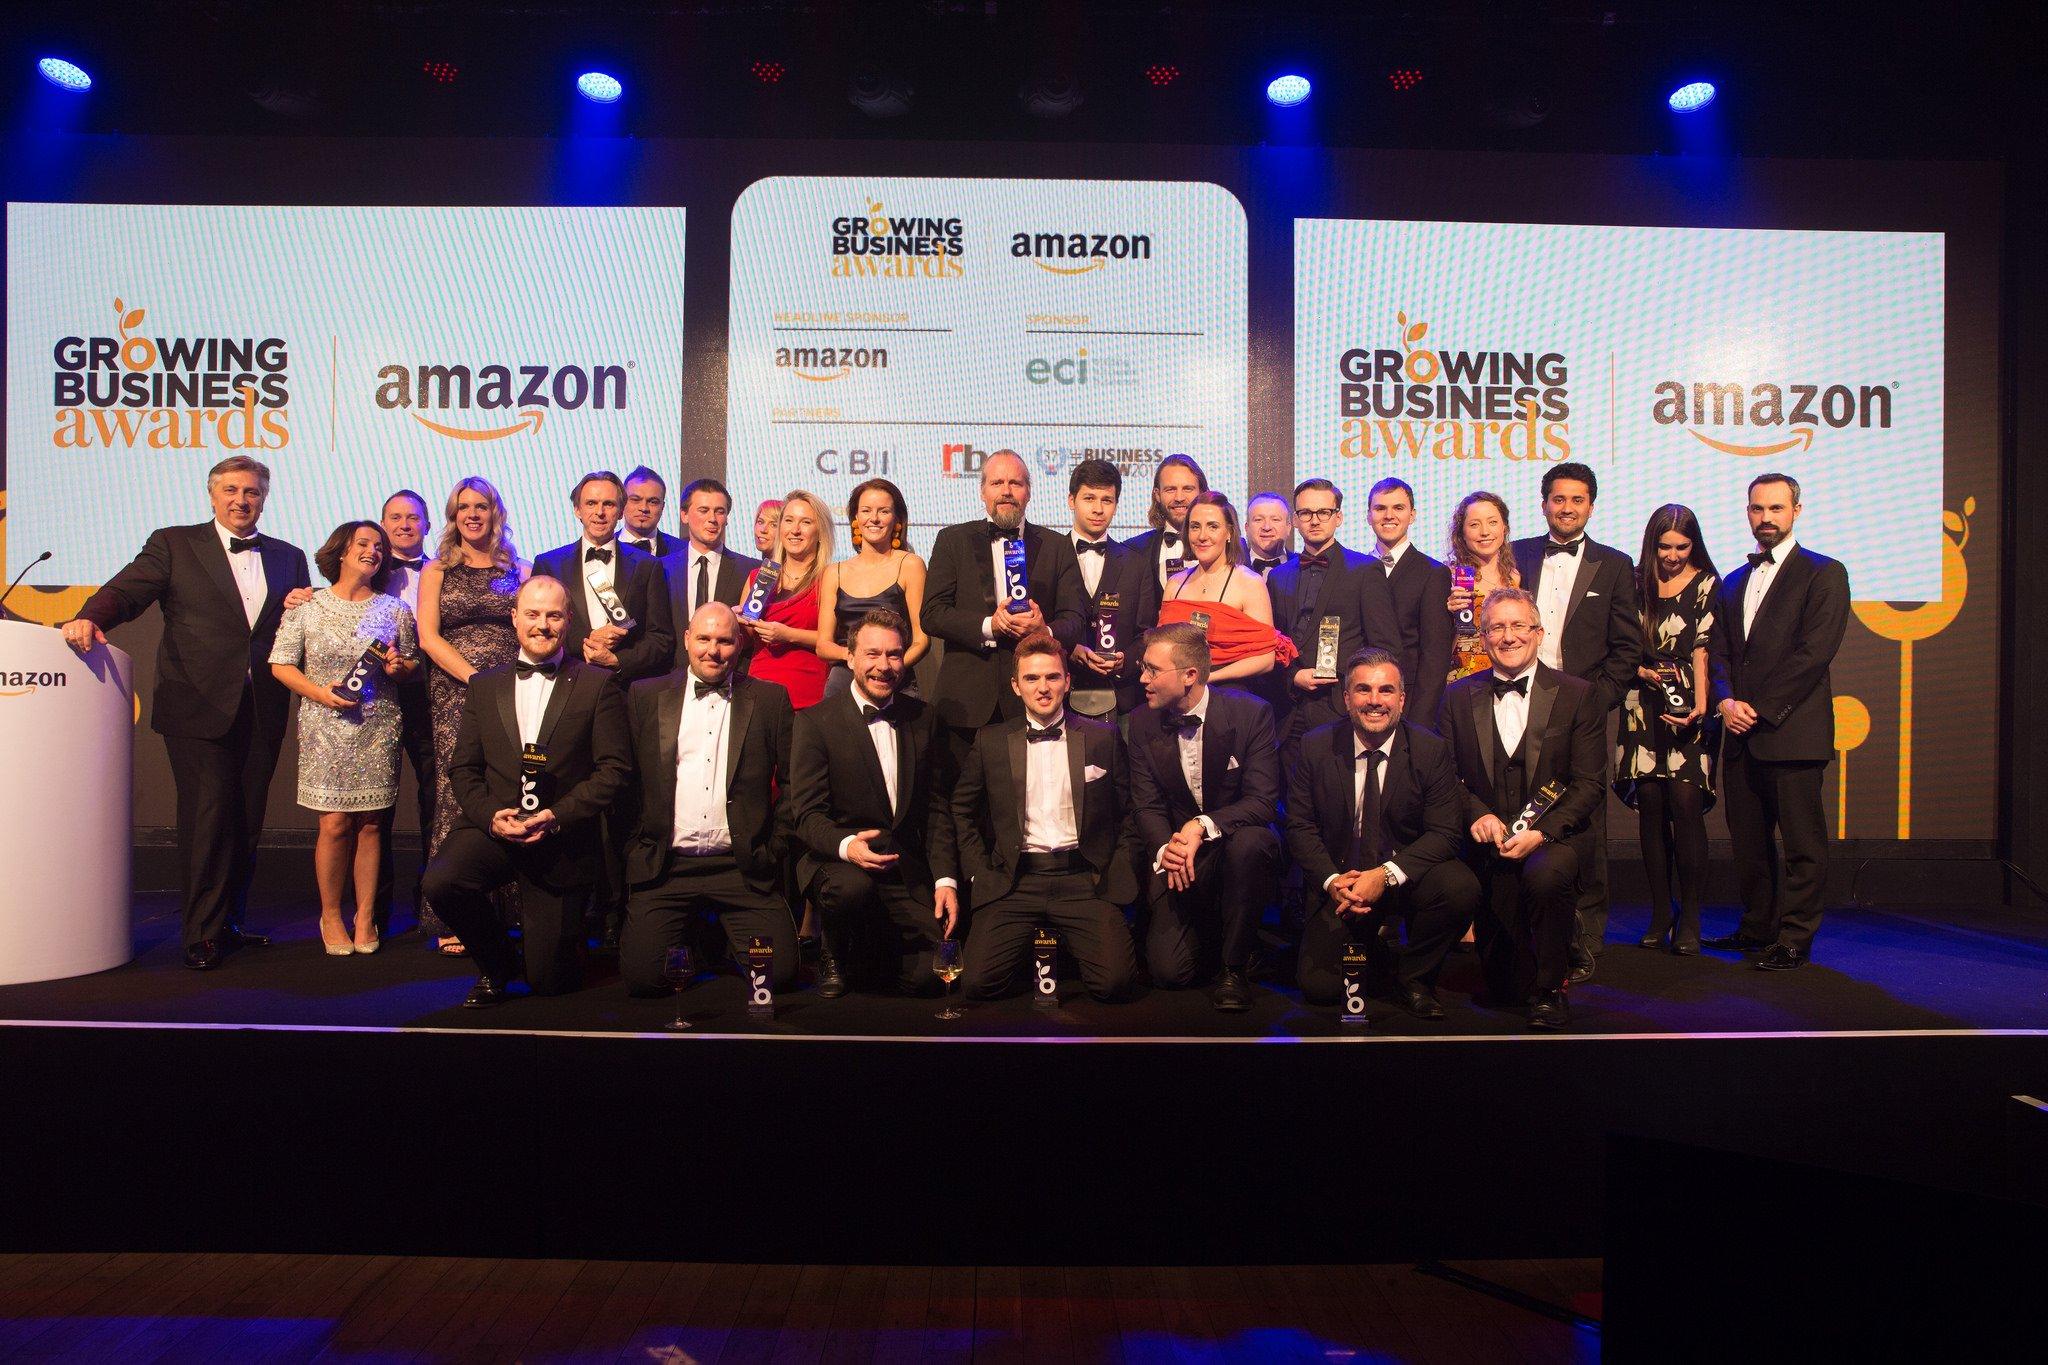 AmazonGrowingBusinessAwards